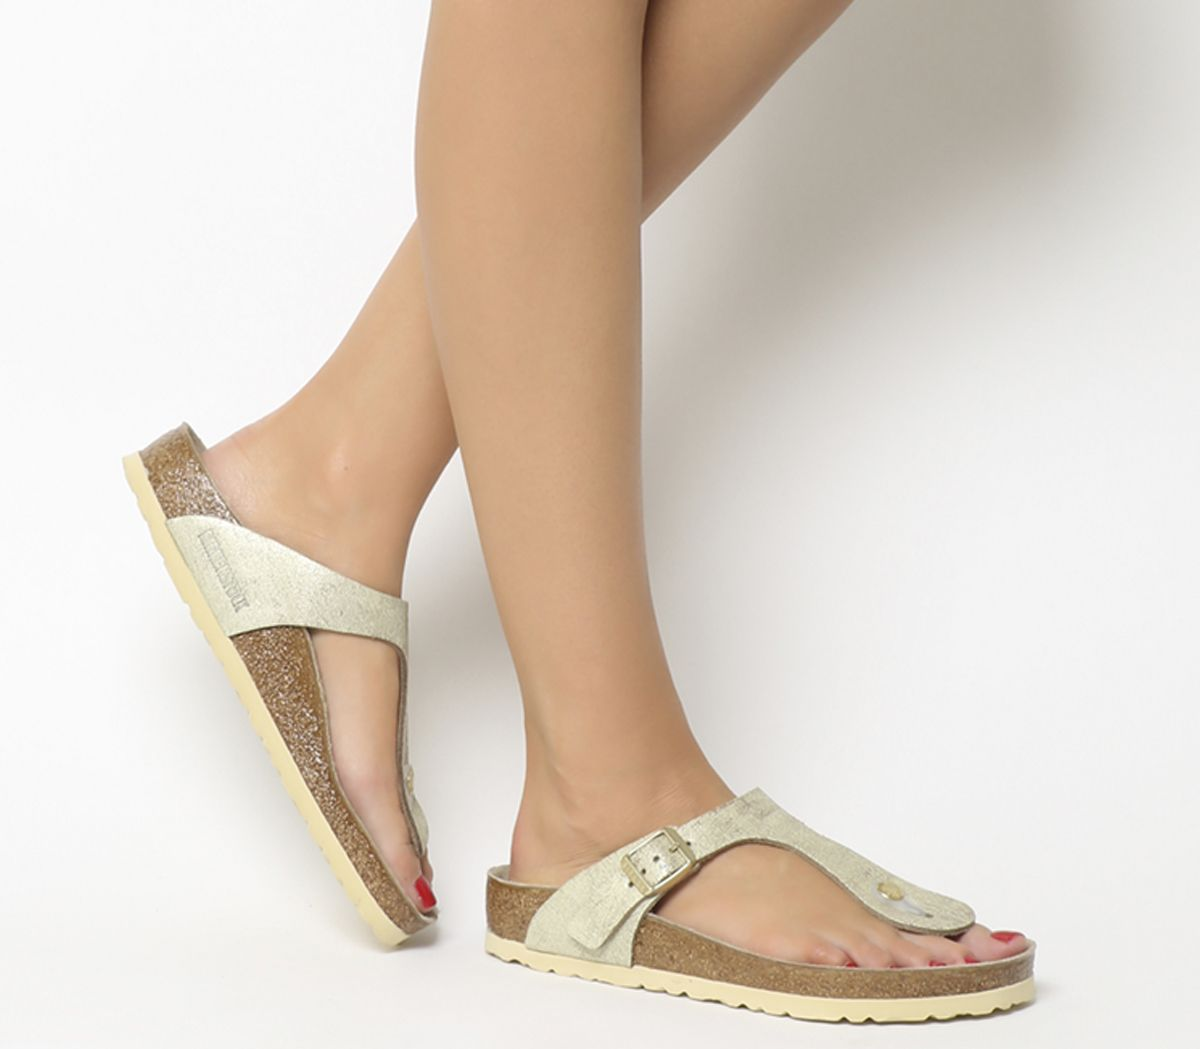 d6caf6265df7 Birkenstock Gizeh Toe Thong Sandals Washed Metallic Cream Gold - Sandals